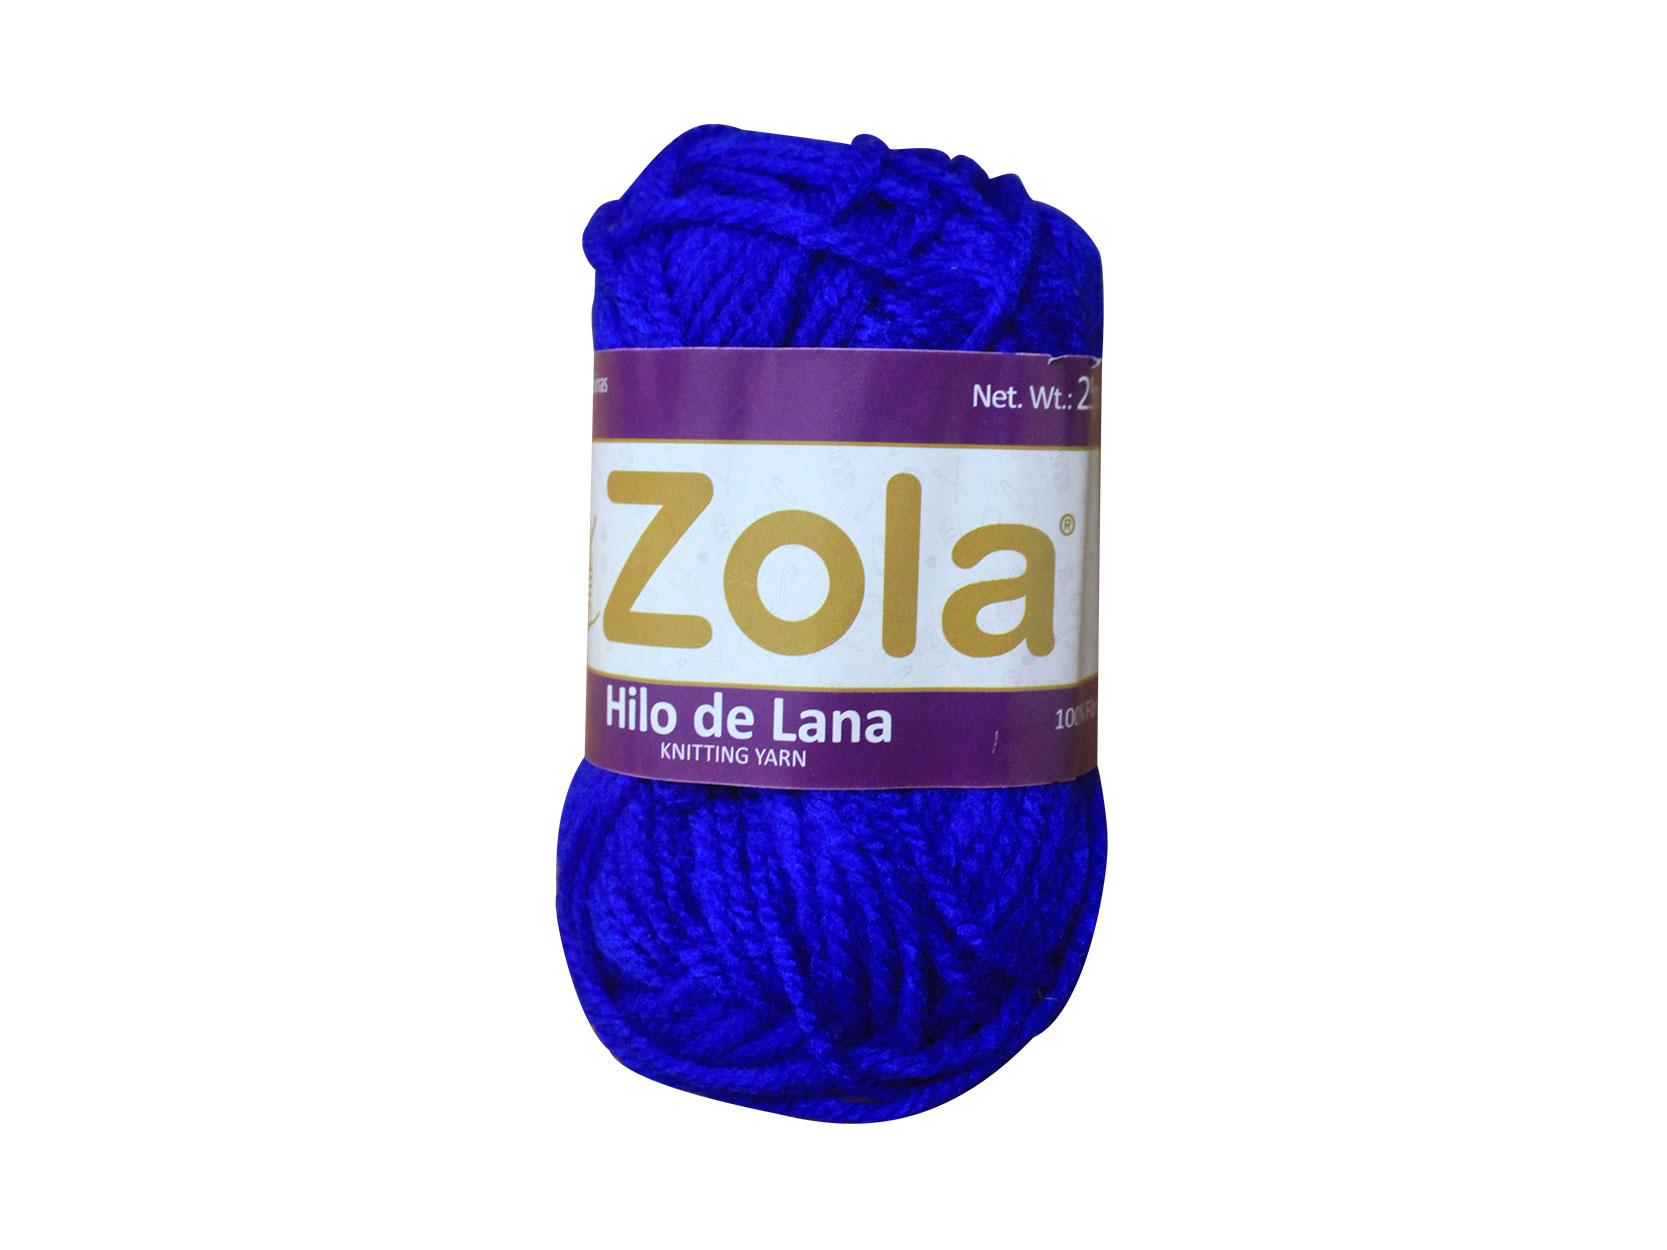 LANA AZUL ZOLA 7A018-KY-25G-SBU